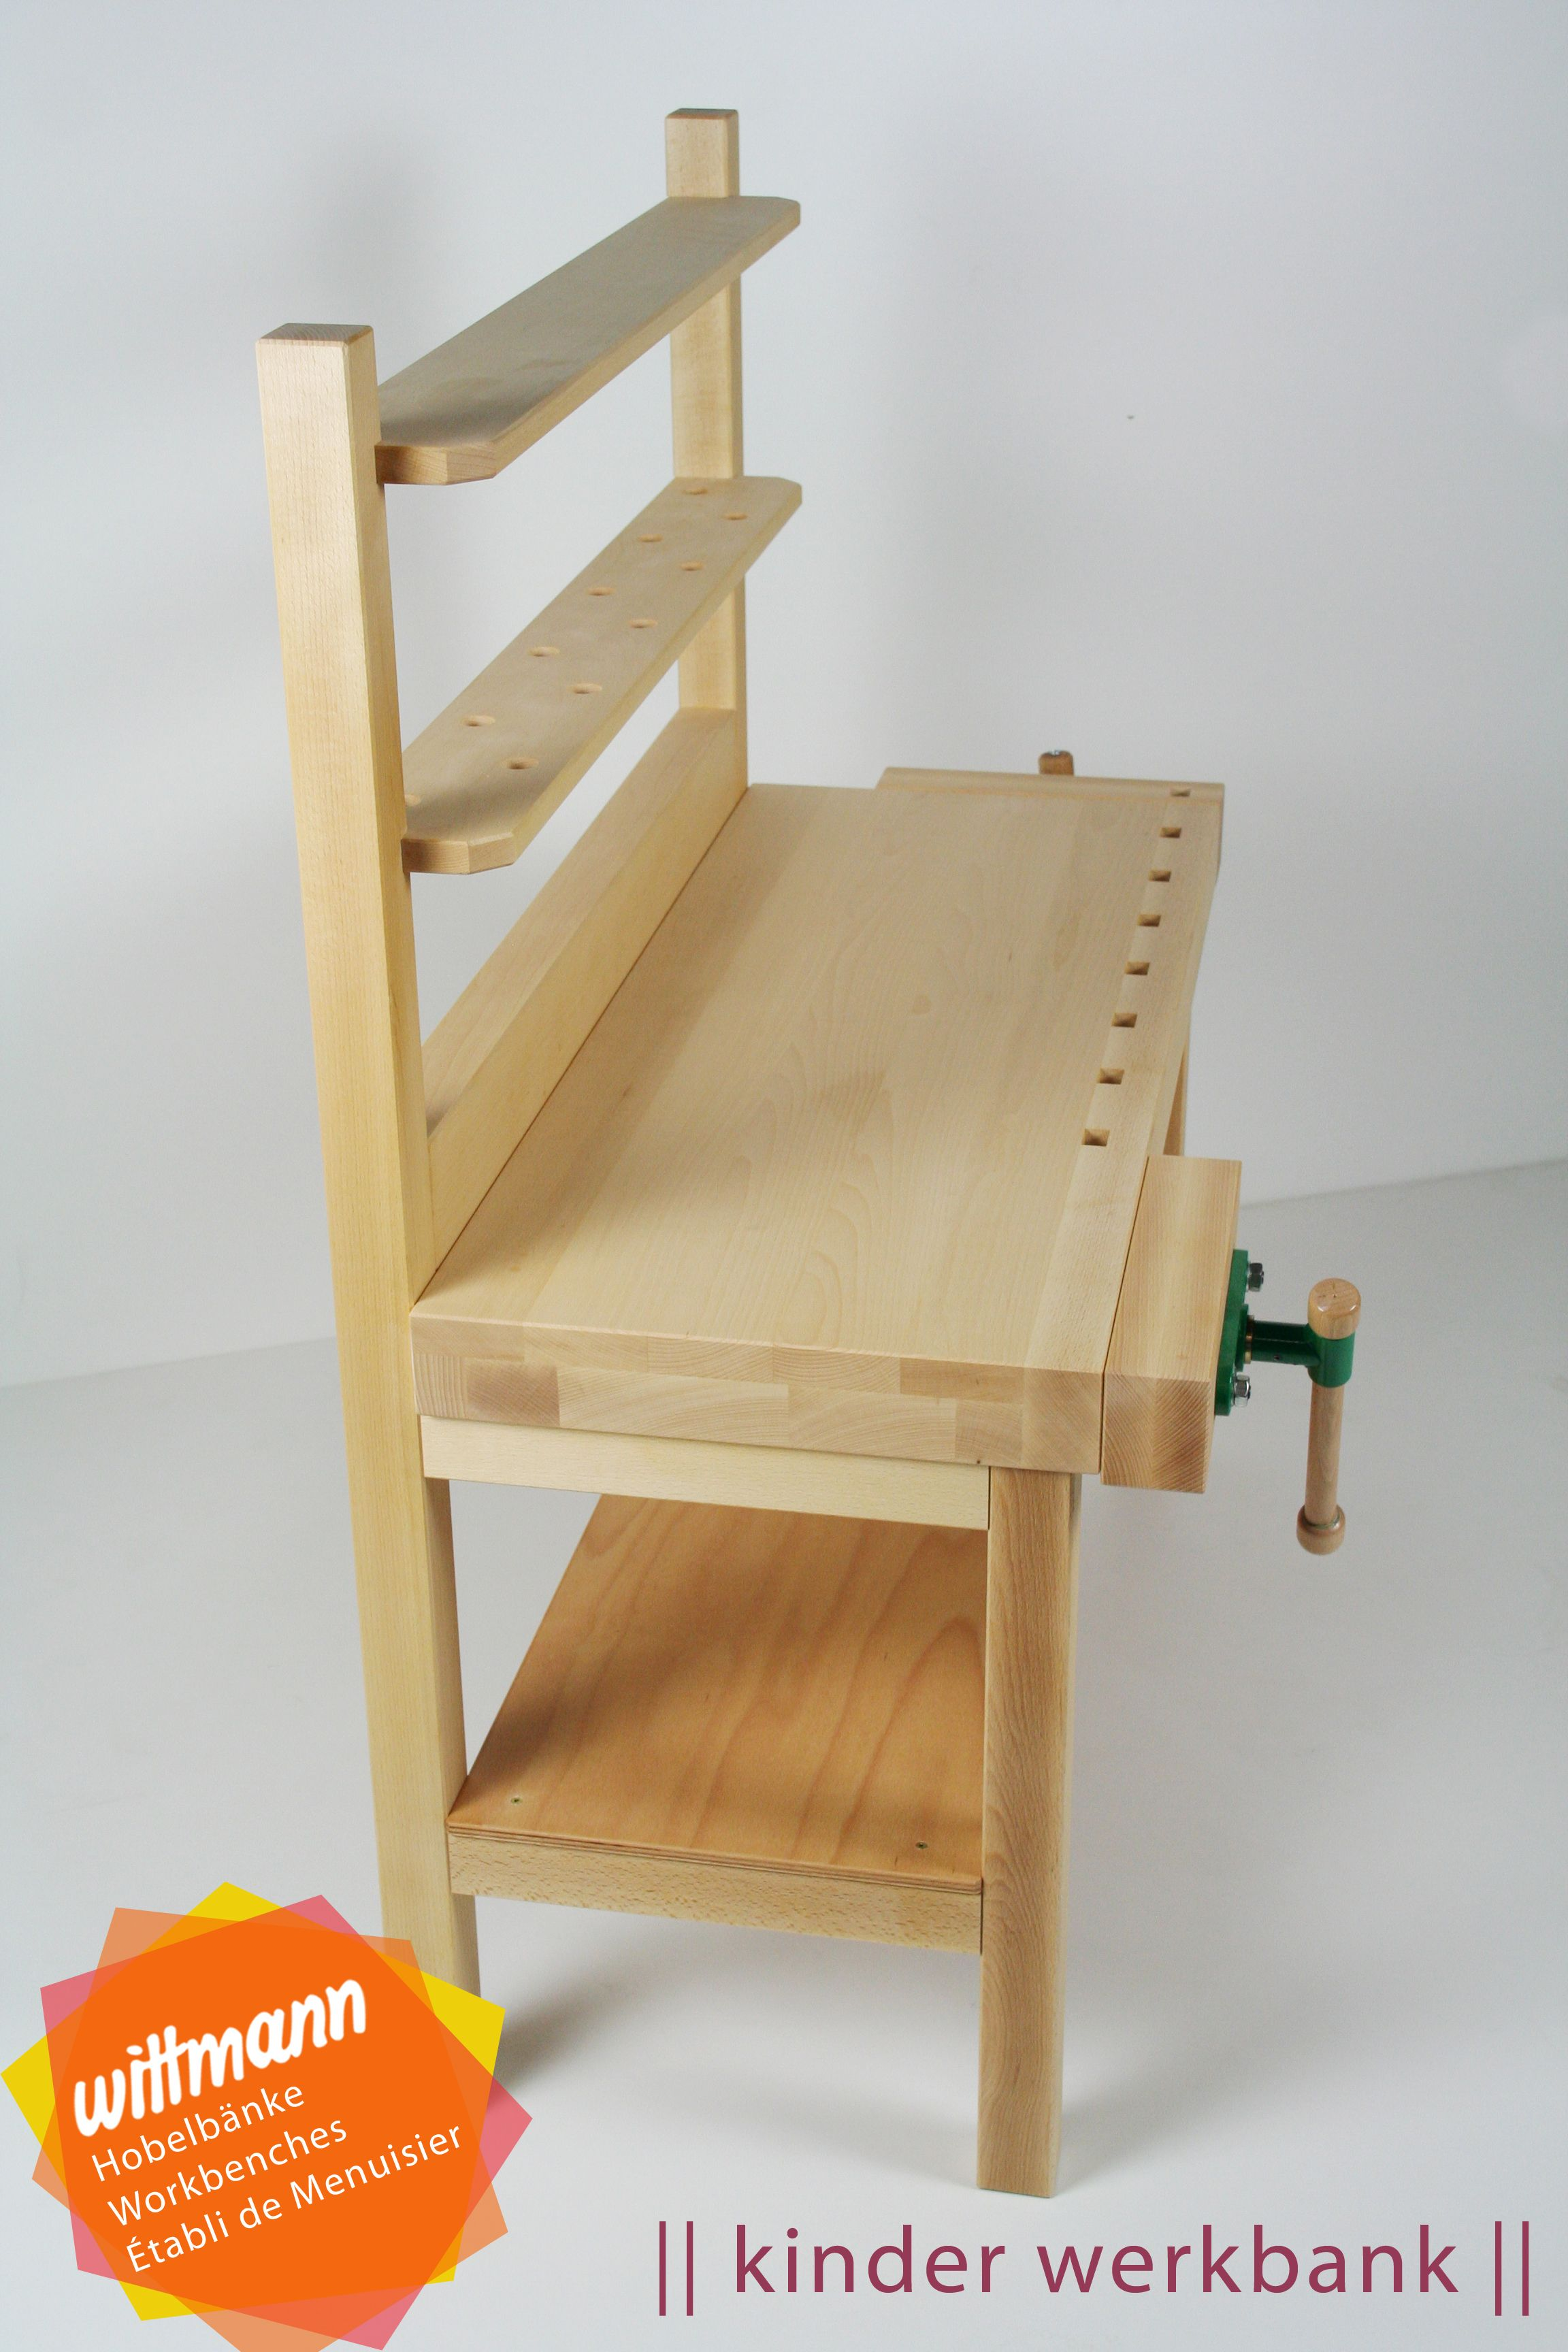 kinder werkbank von wittmann | niklas | pinterest | diy toys, kids